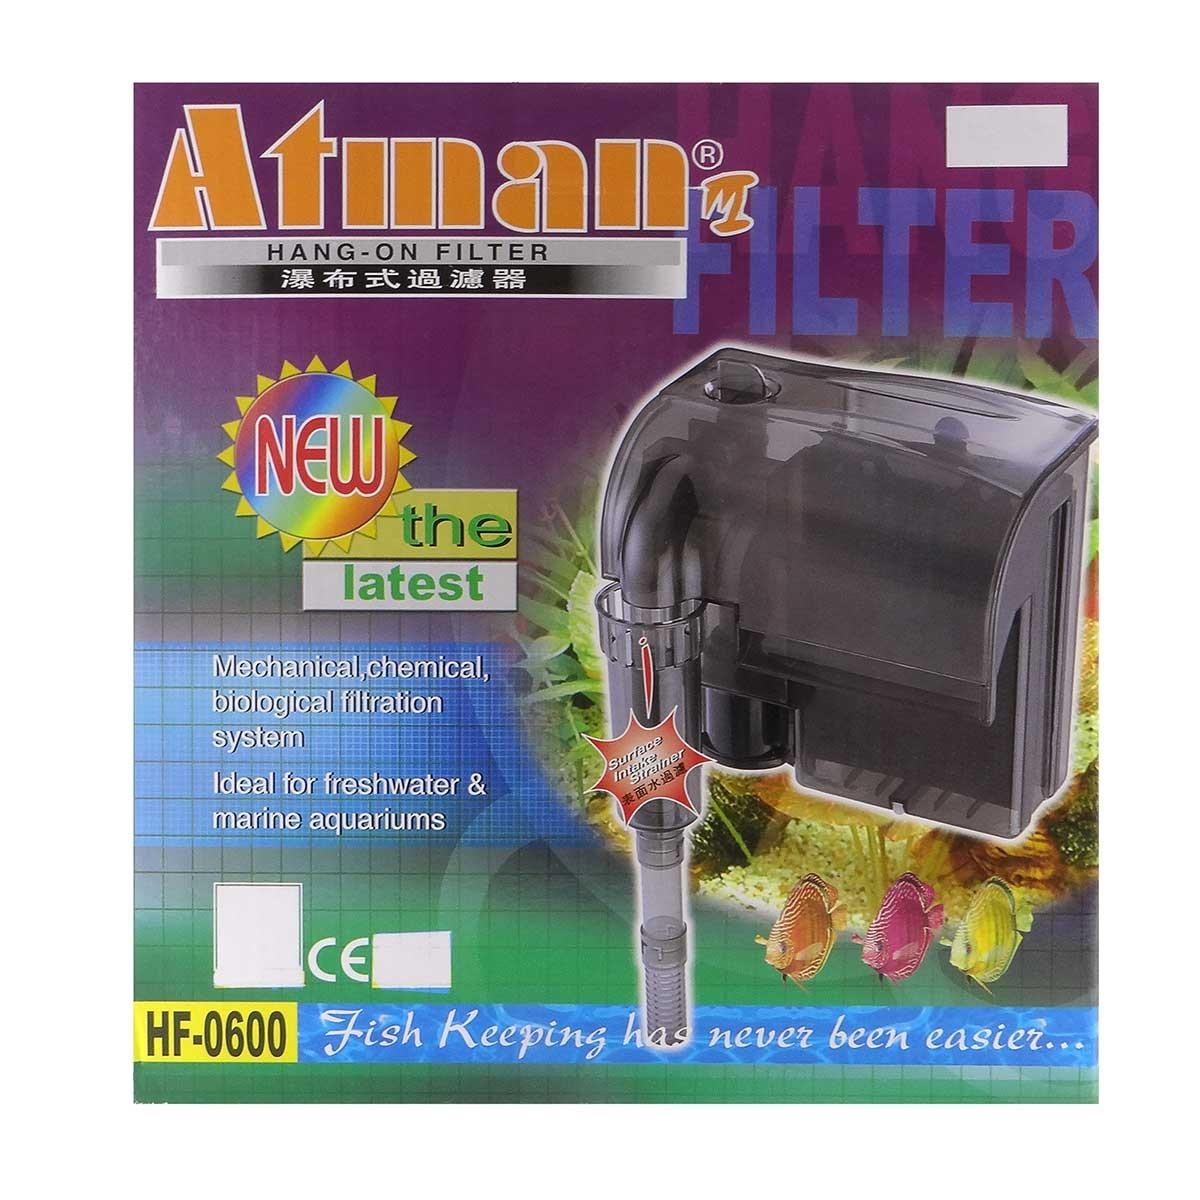 Filtro Externo Hang- On Atman Hf-600 650 L/h P/ Aquários